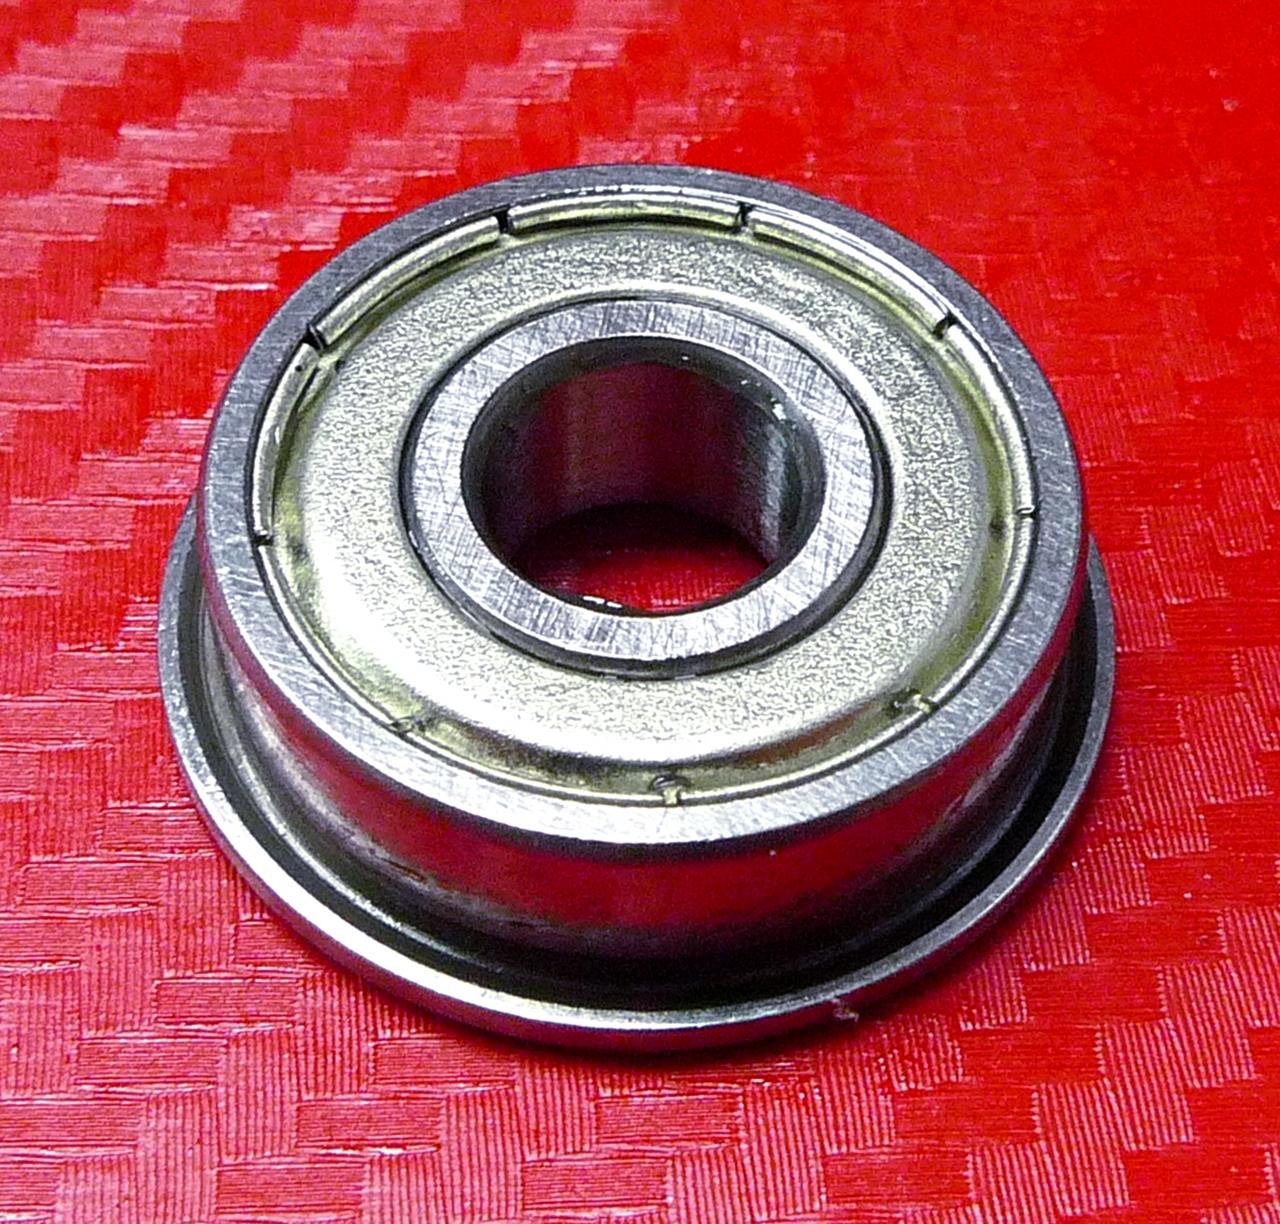 10pcs F6700zz Metric Metal FLANGE Ball Bearing 10*15*4 F6700z 10x15x4mm